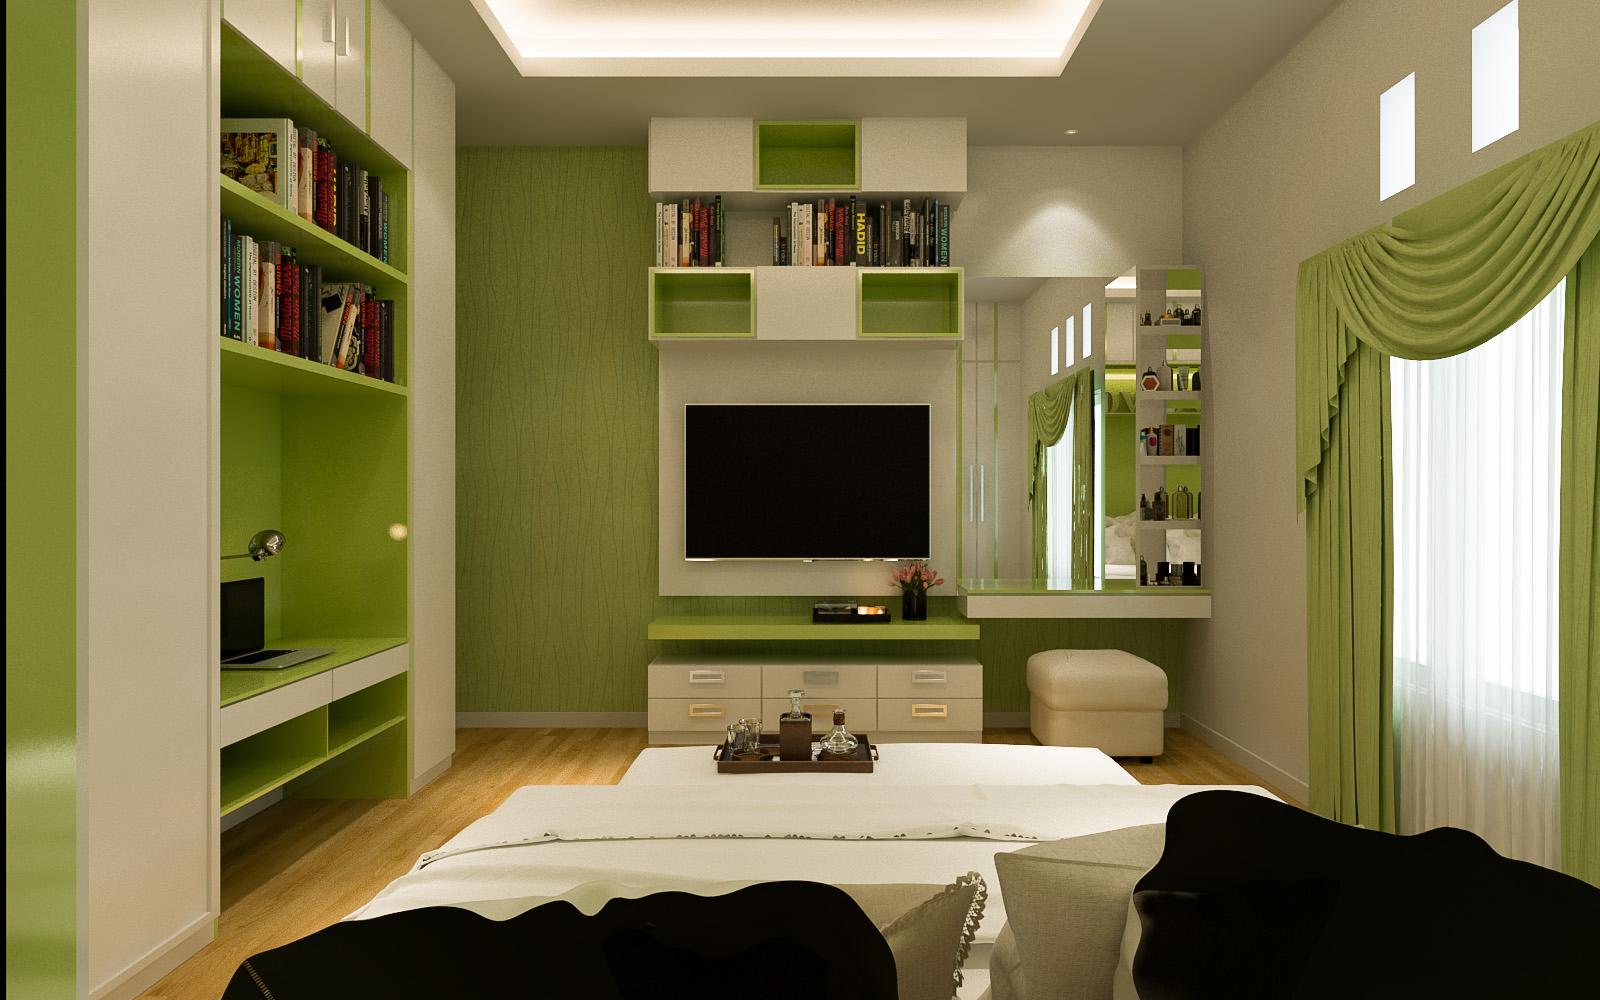 desain interior kamar tidur utama milik pak samsul, makassar   jasa